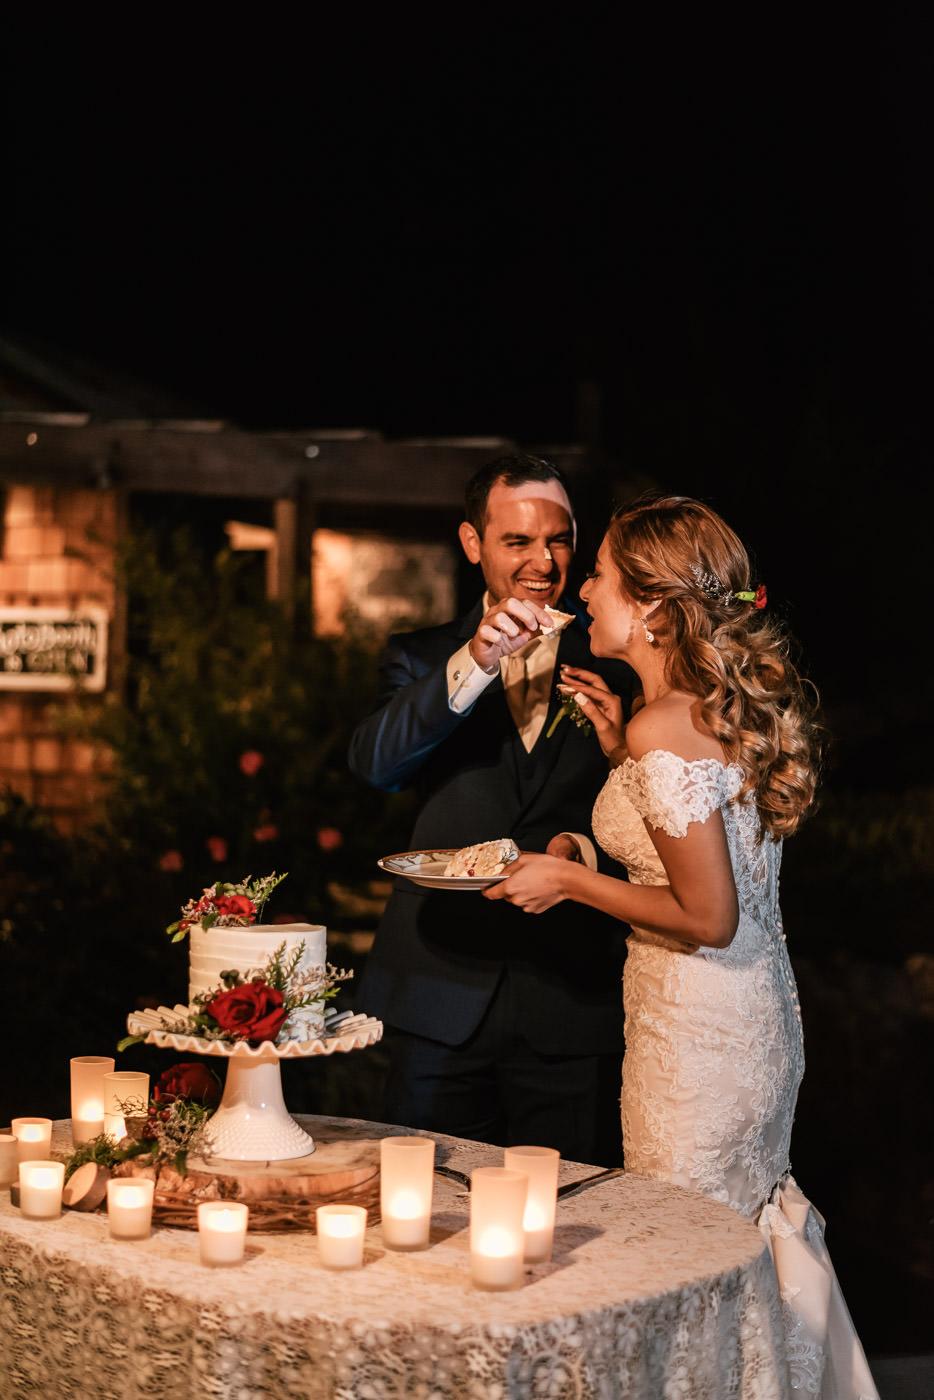 Groom feeds his bride a piece of wedding cake.